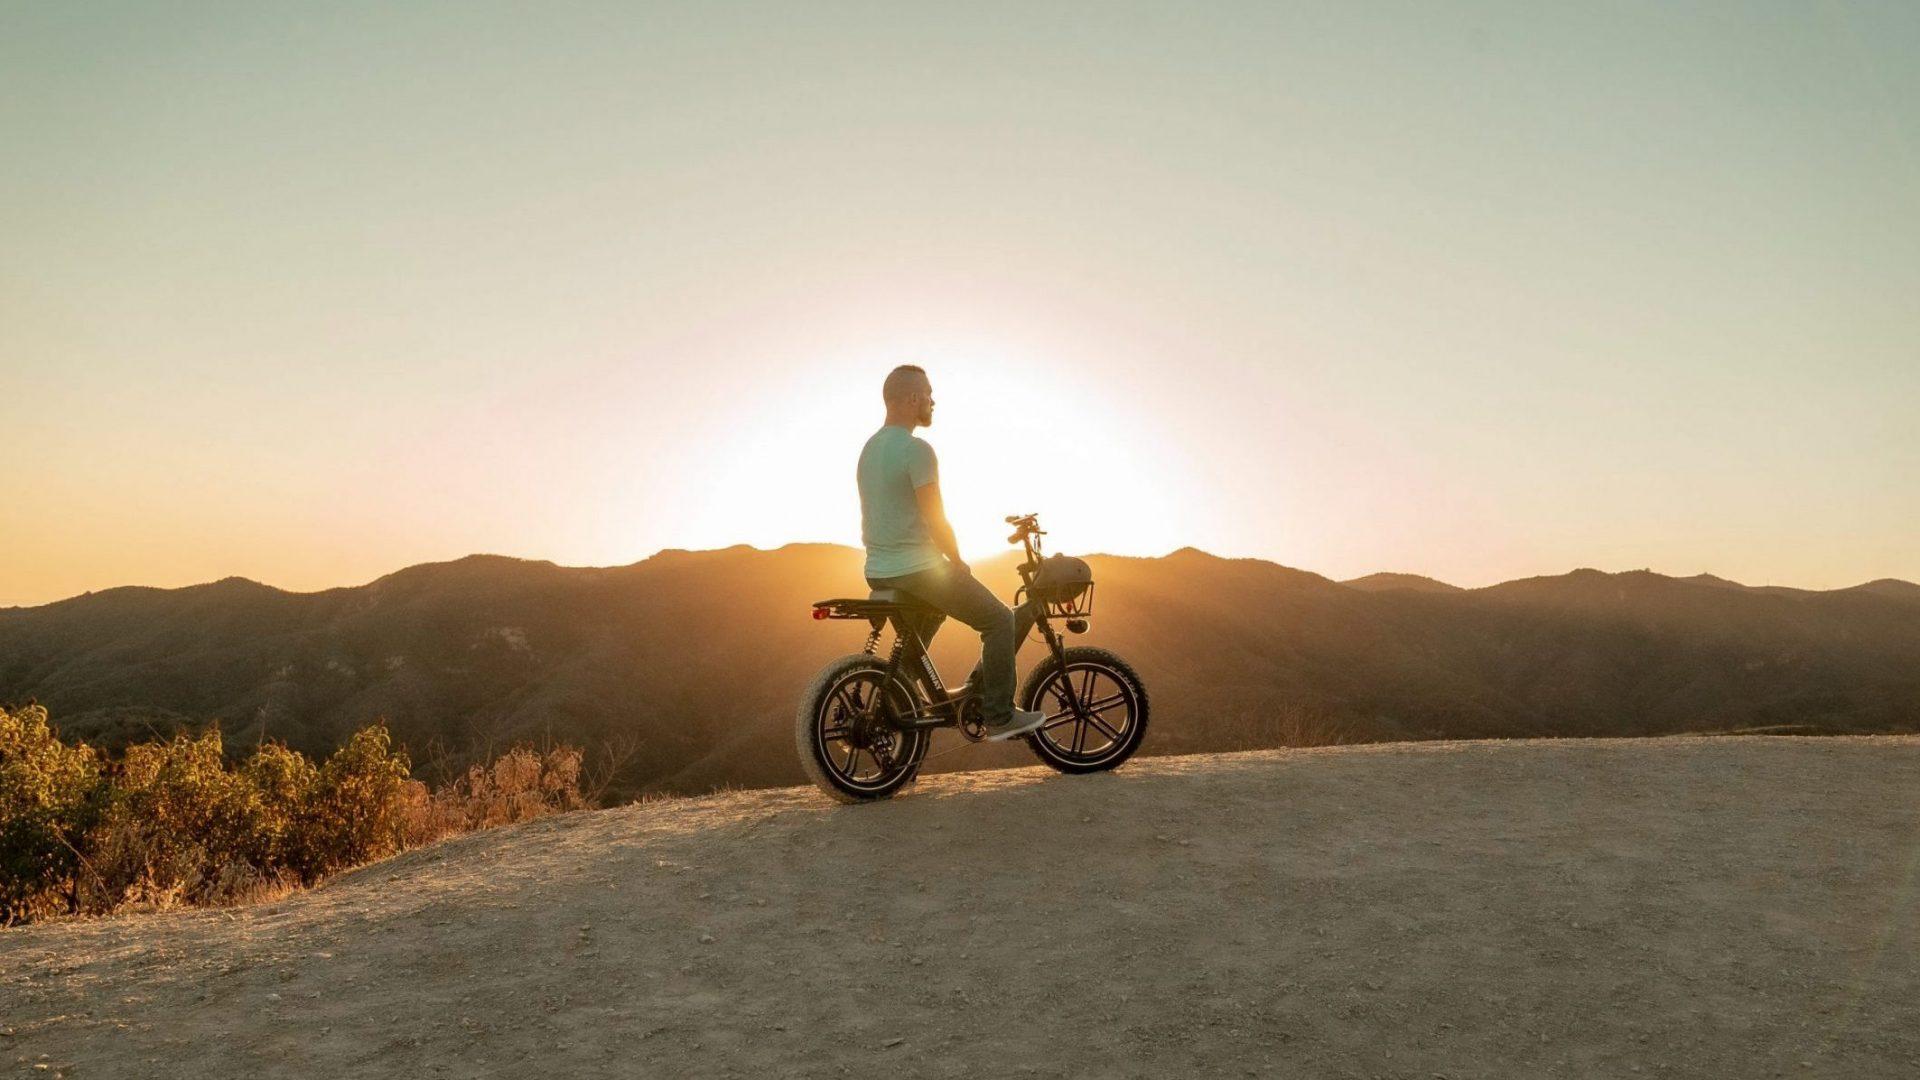 22 June, Himiway Bikes - unsplash